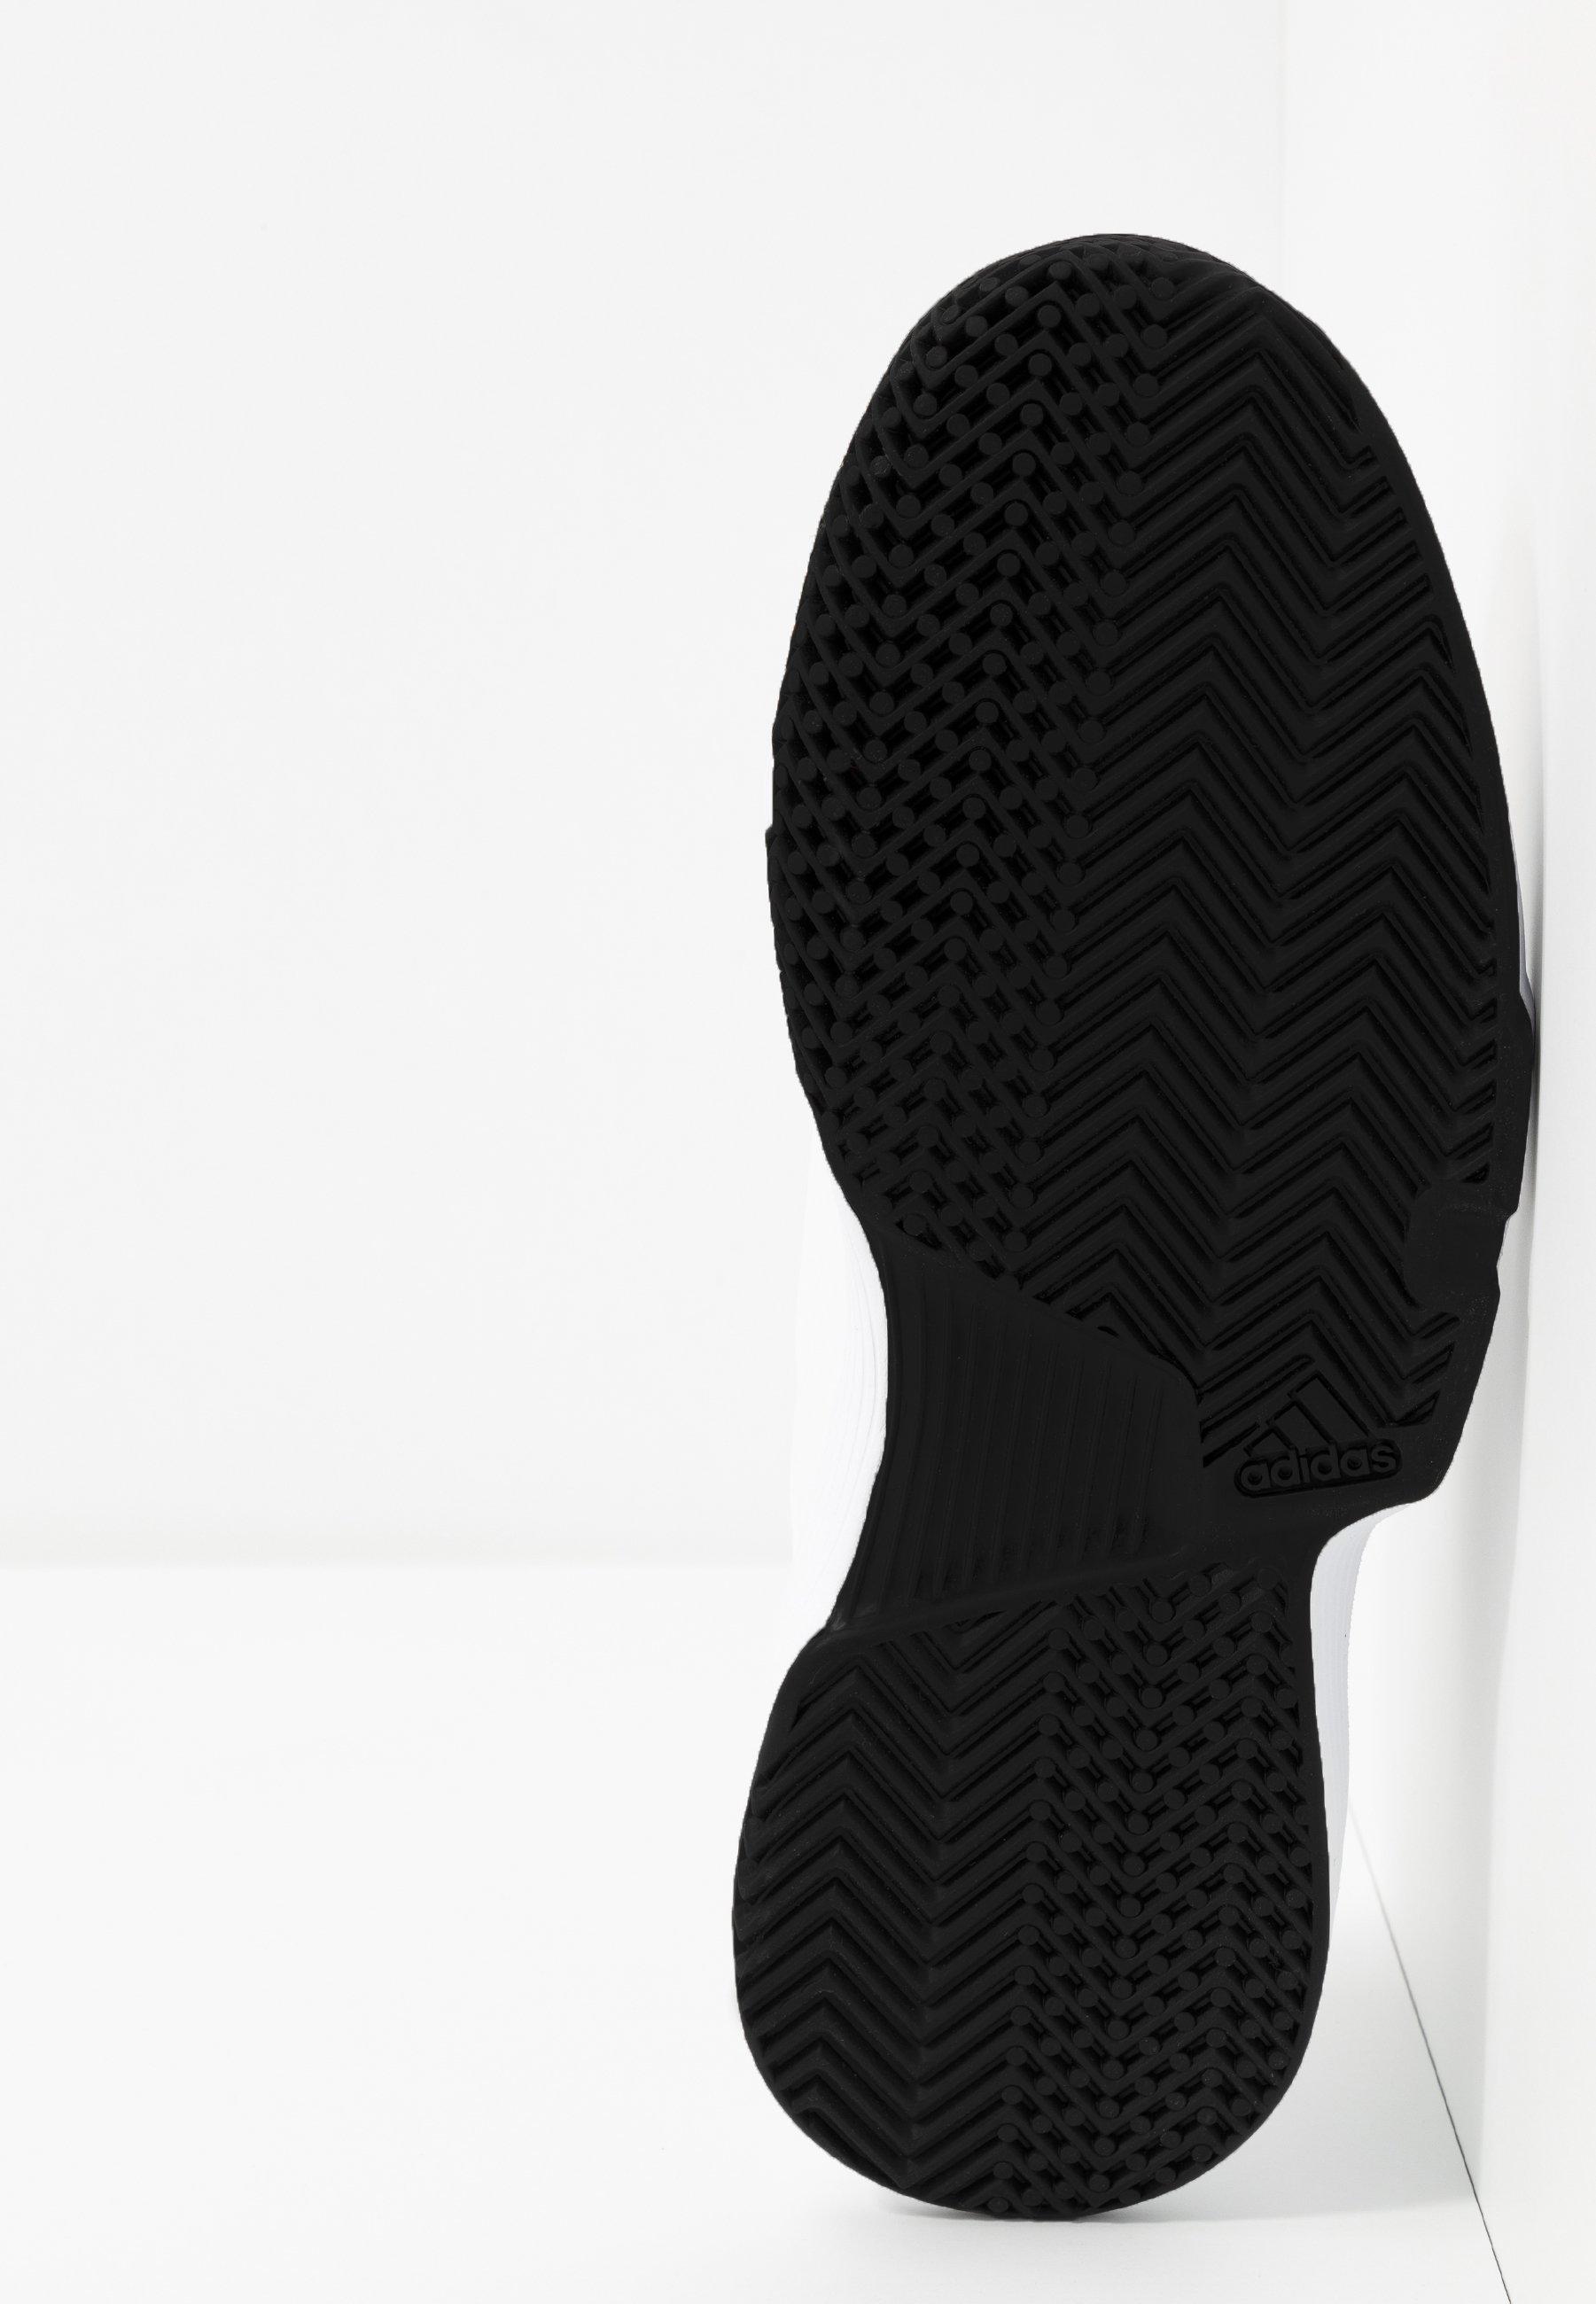 Sale Fashion Style Men's Shoes adidas Performance GAMECOURT BARRICADE CLOUDFOAM TENNIS SHOES Multicourt tennis shoes footwear white/core black/grey one KHFssxa4W jKPid8unj